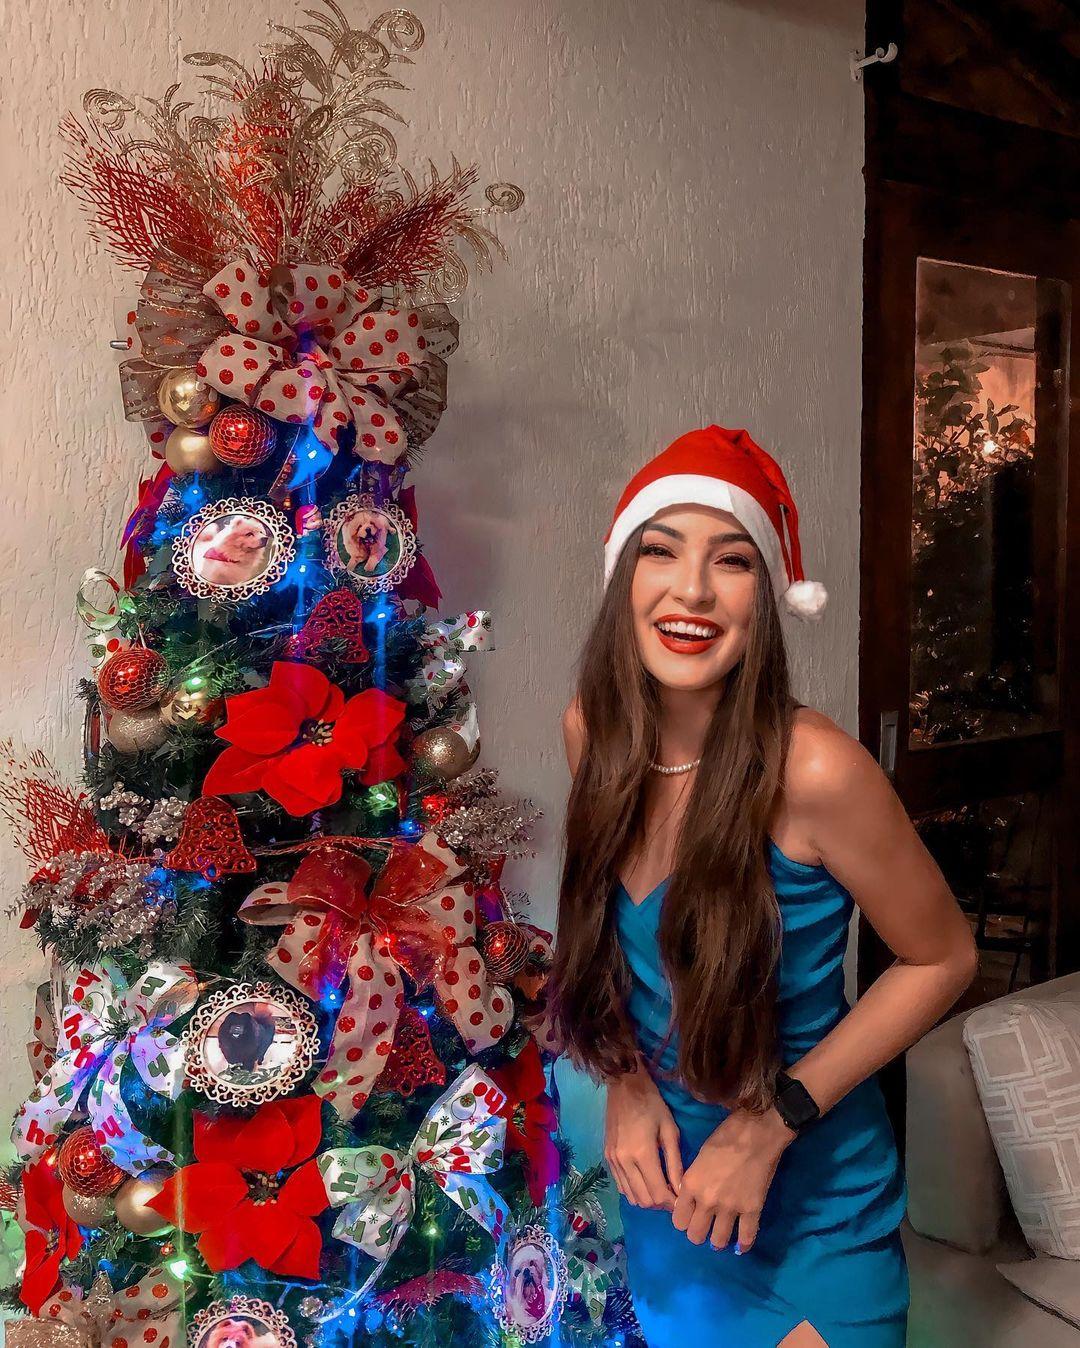 anne karoline lisboa, miss simpatia de miss brasil mundo 2019. 13211712